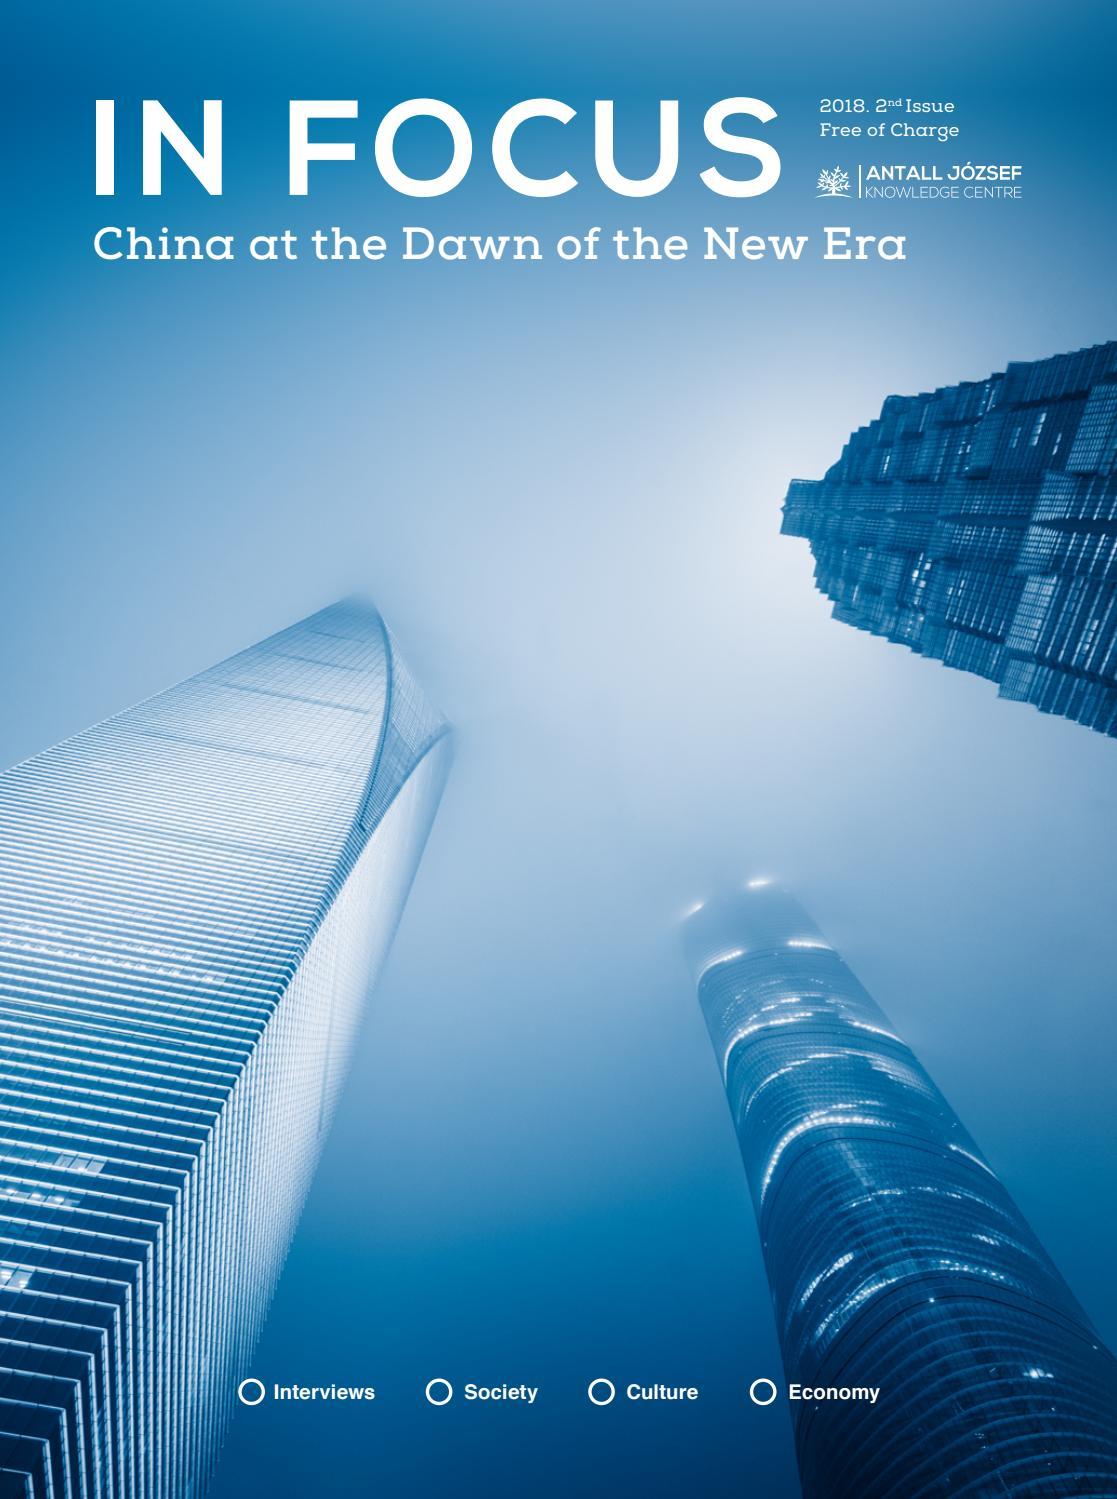 Infocus China 2018 1 By Antall Jozsef Tudaskozpont Issuu